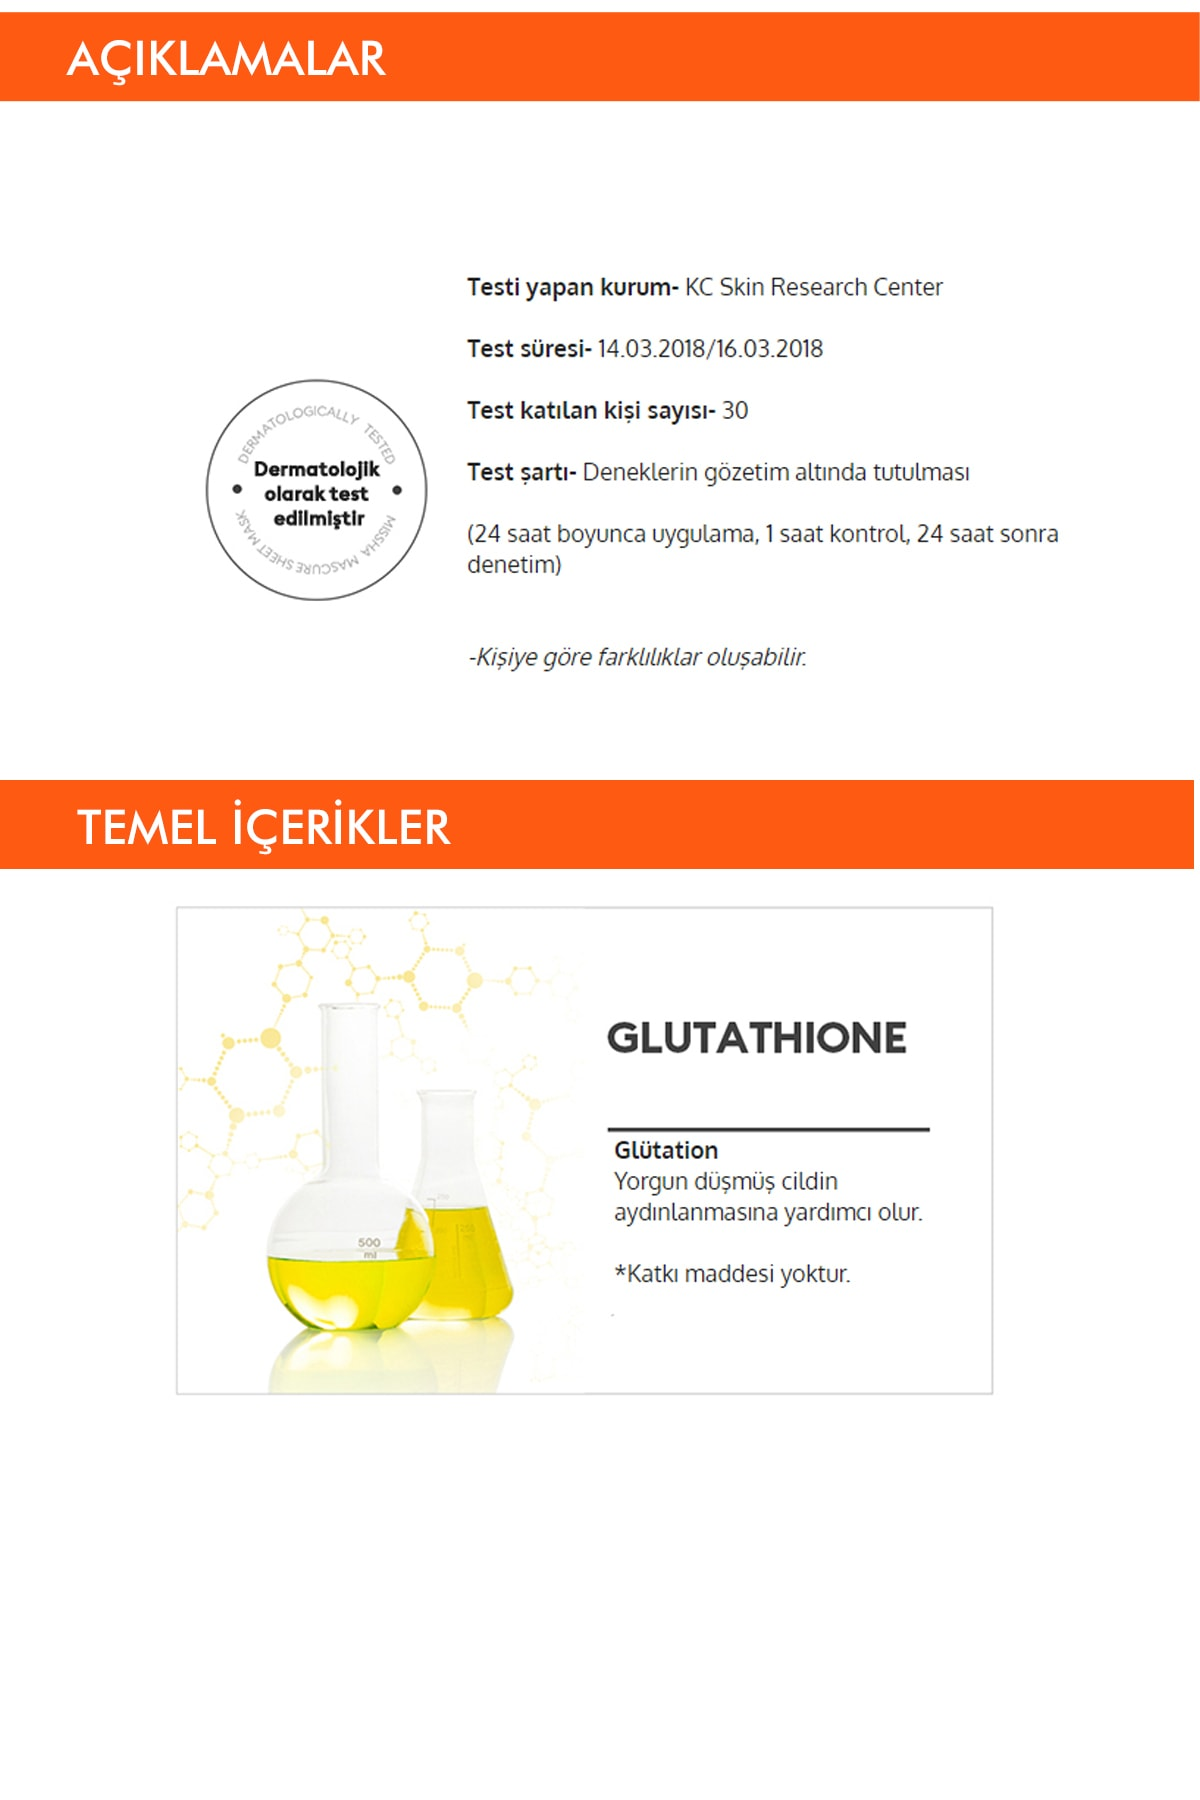 Missha Beyazlatıcı Glutathione Yaprak Maske (1ad) Mascure Whitening Solution Sheet Mask 2